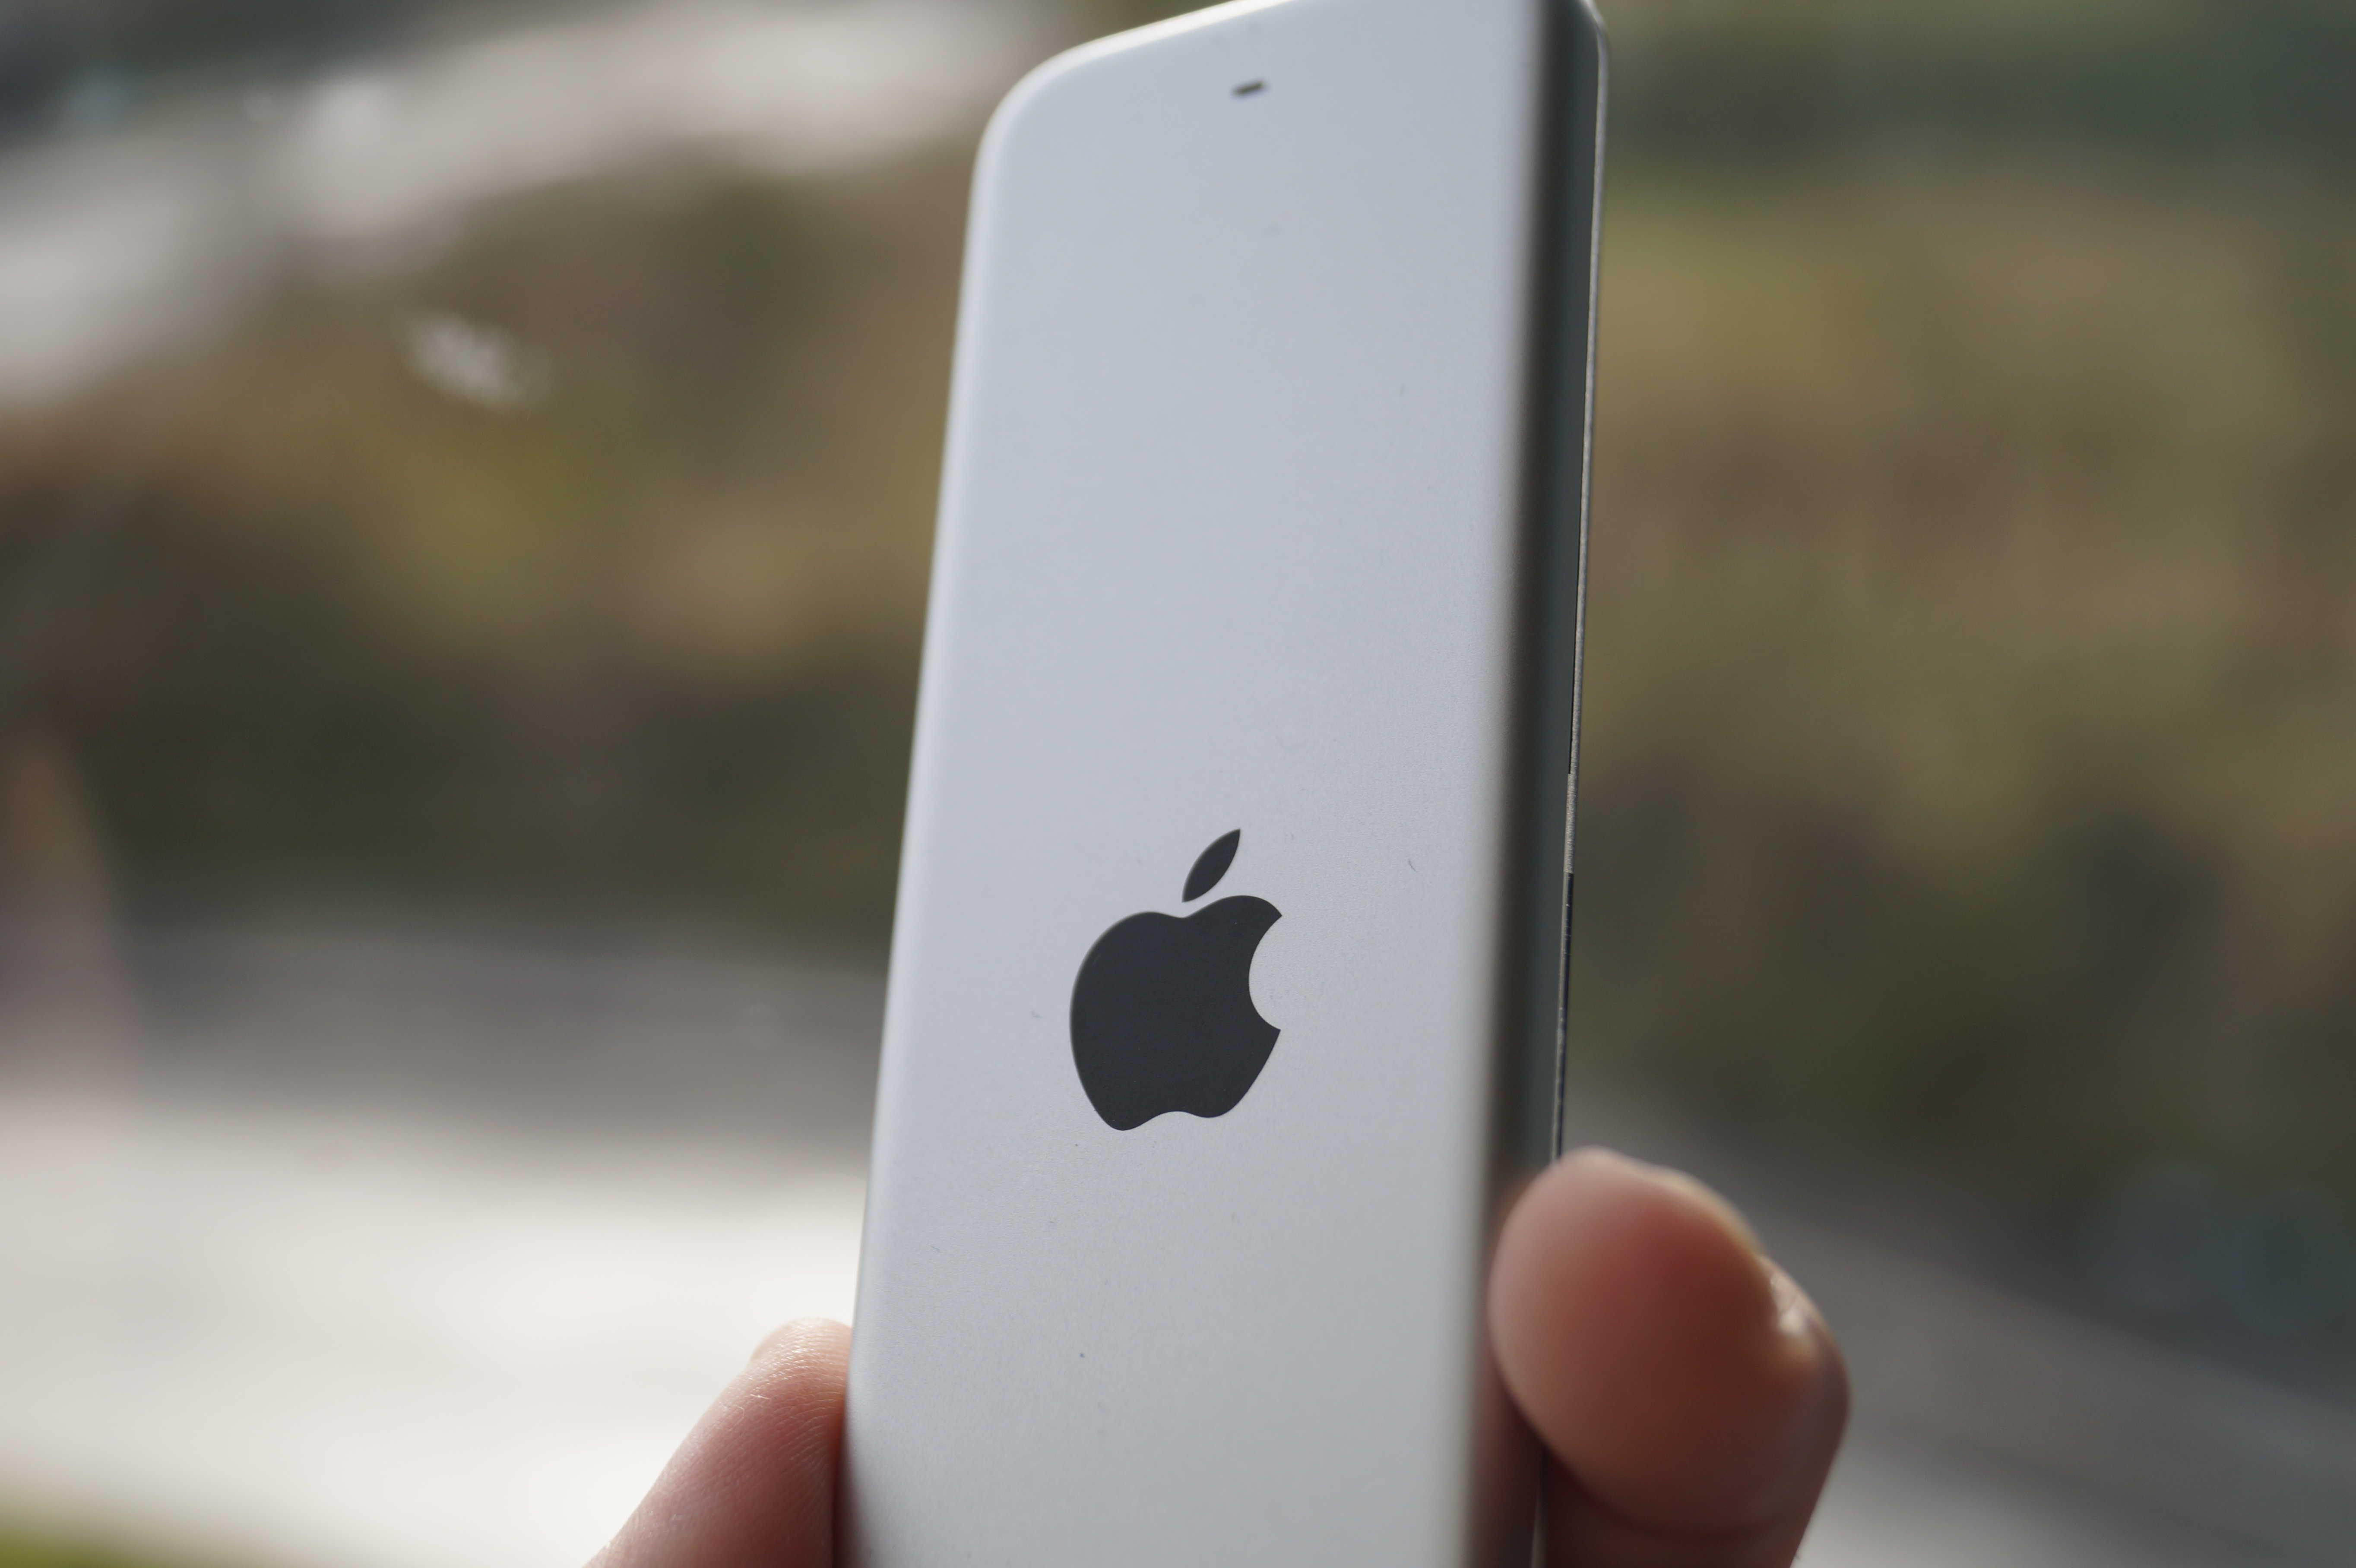 The Siri Remote is like a teeny, tiny iPad